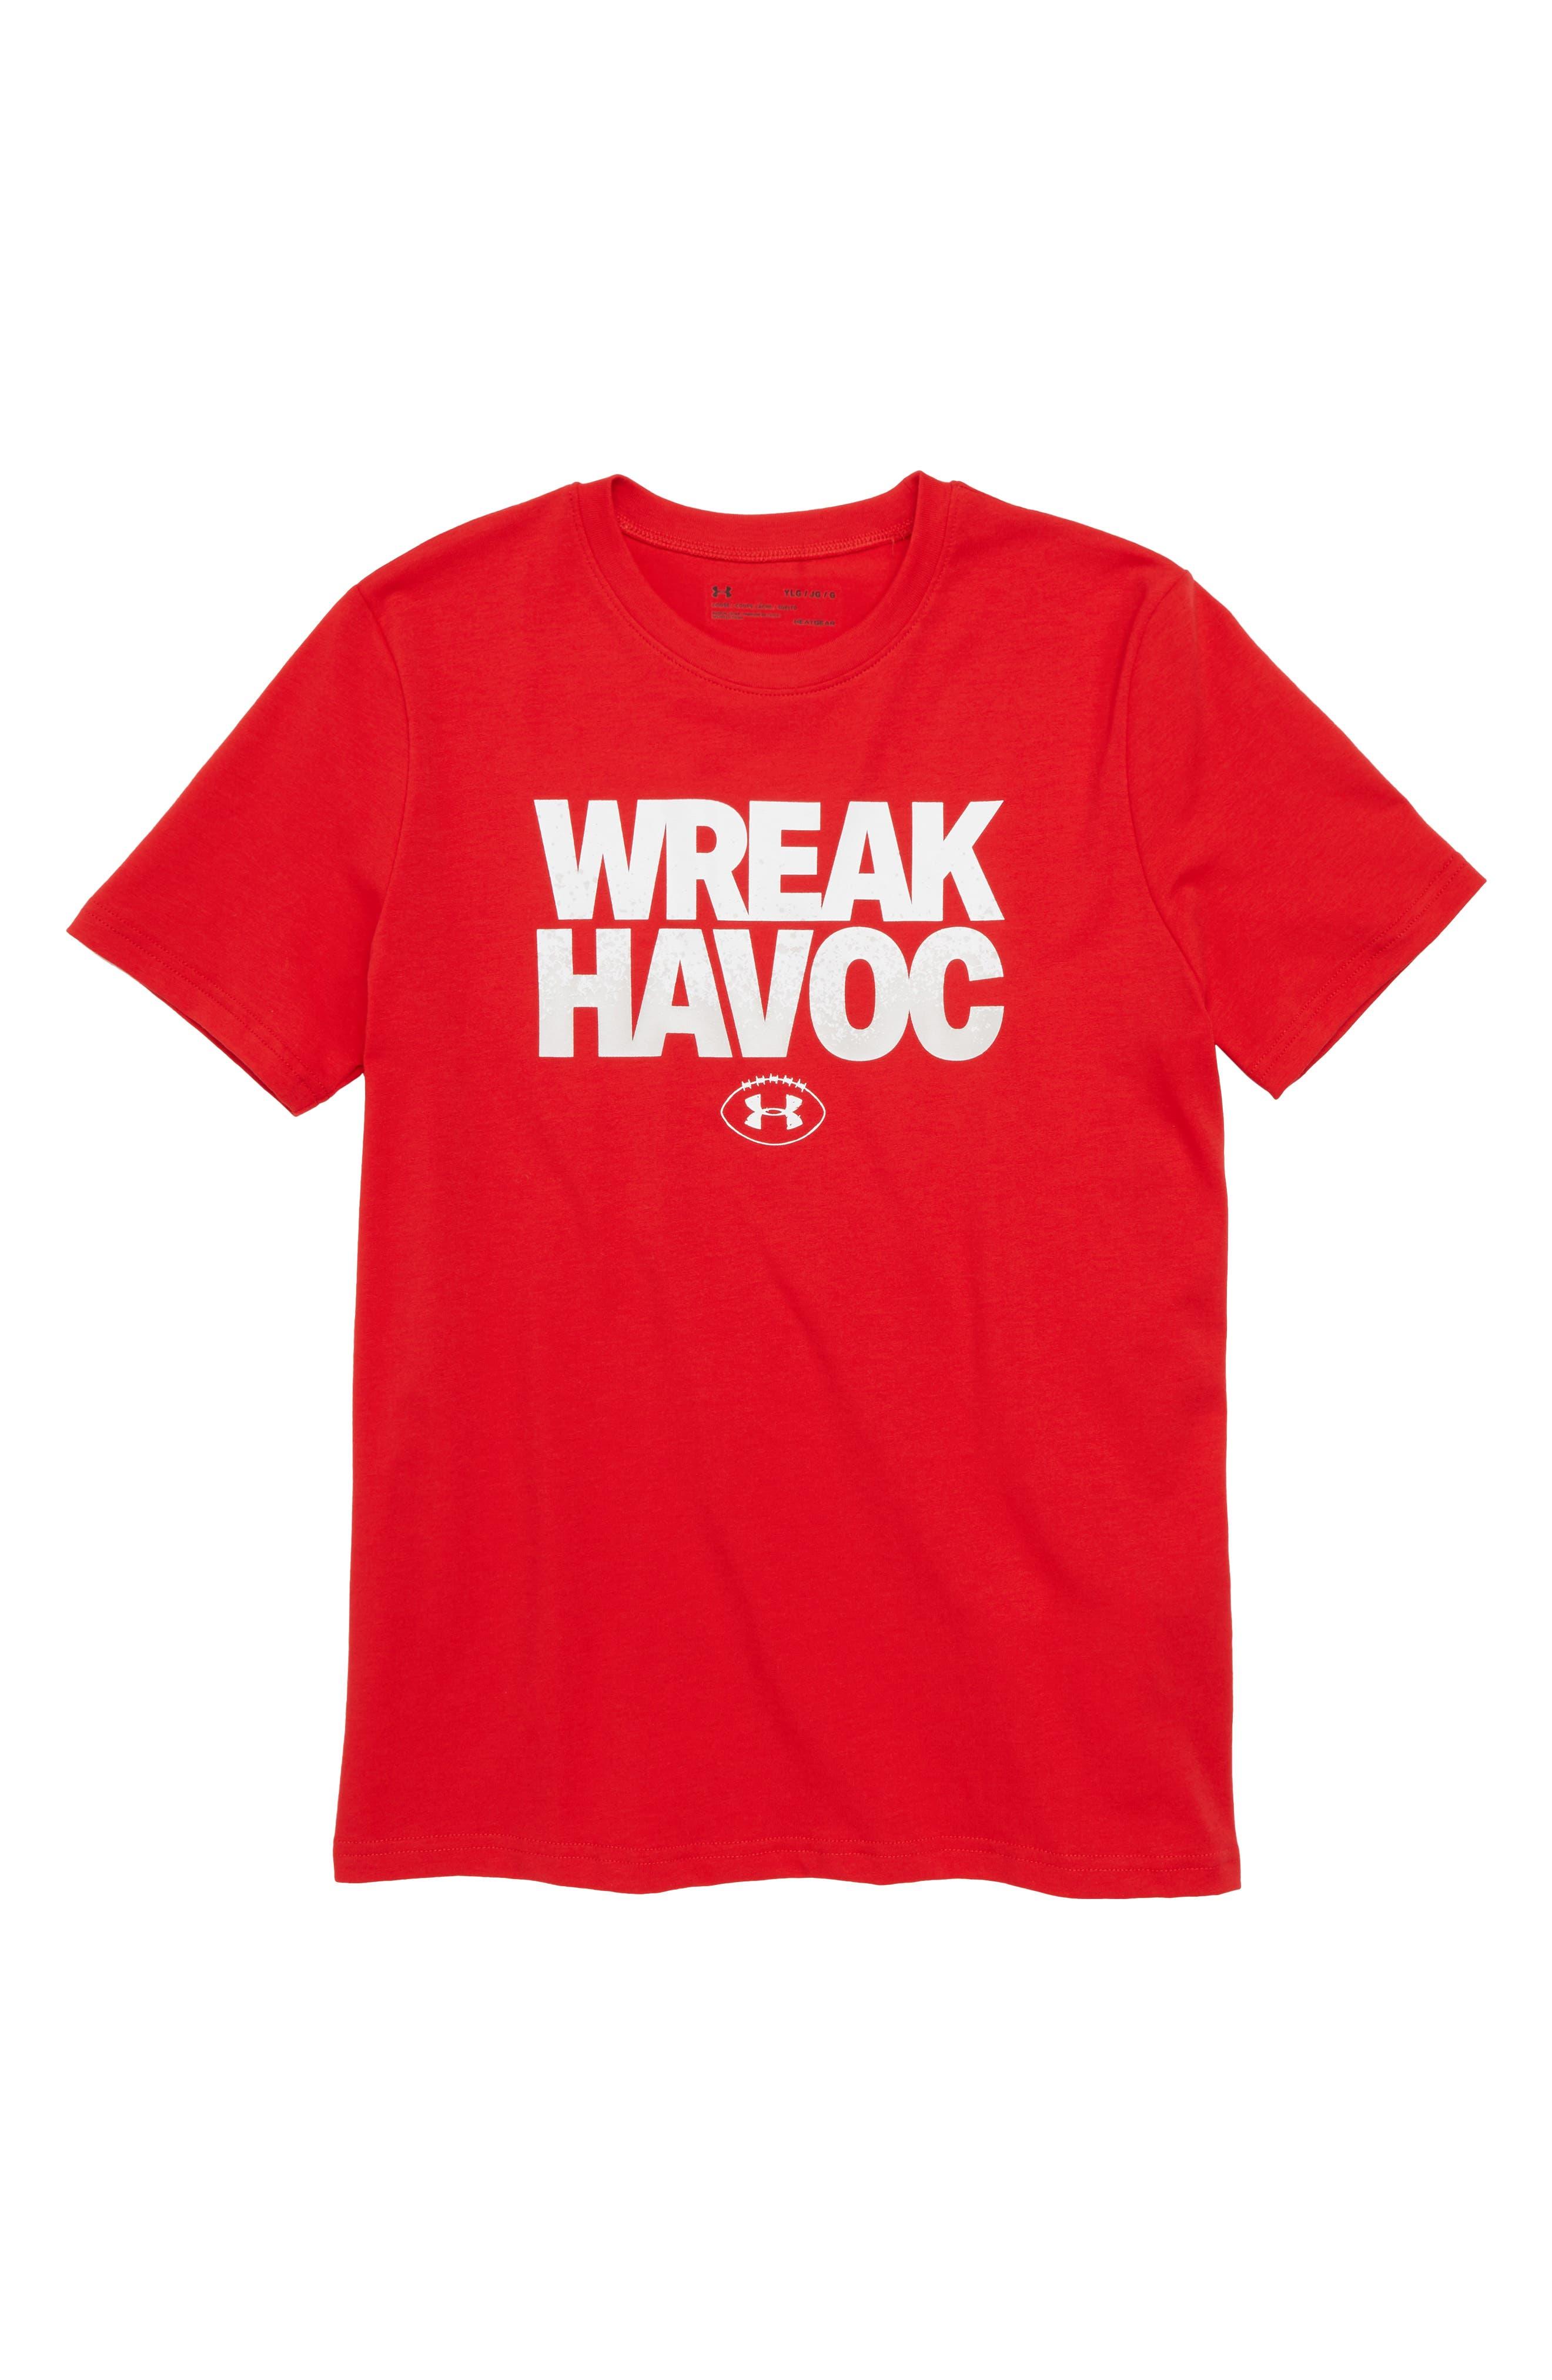 Under Armour Wreak Havoc Graphic T-Shirt (Big Boys)